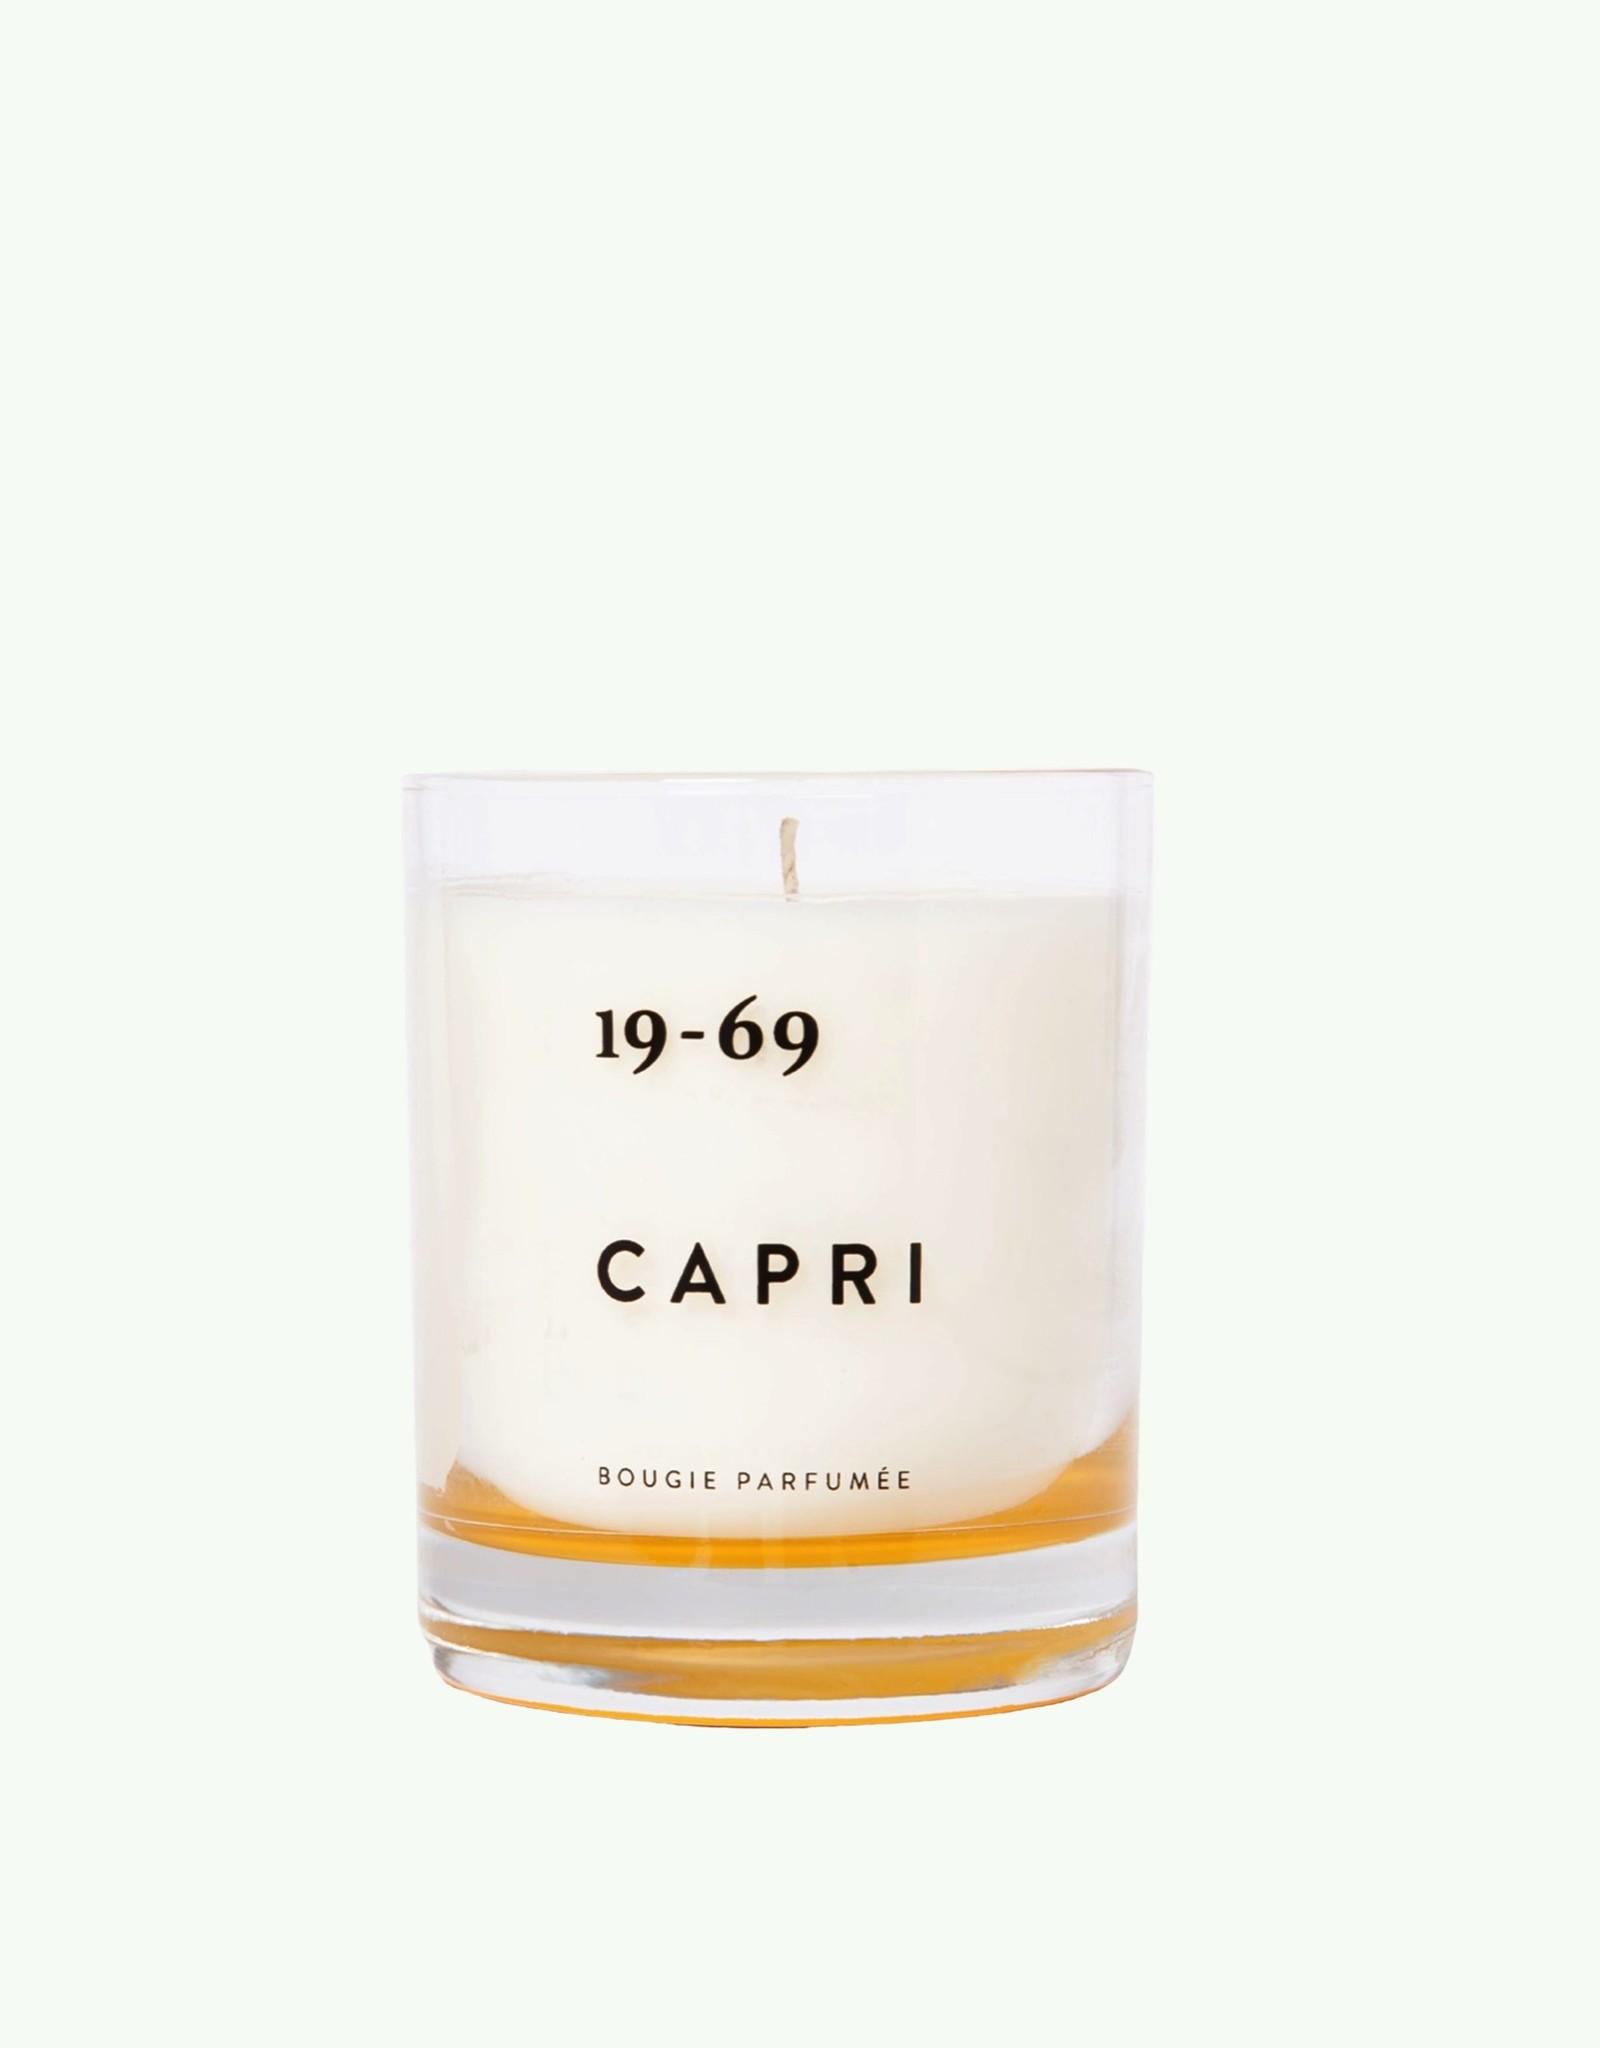 Nineteen Sixty Nine Nineteen sixty nine - Capri - Scented Candle